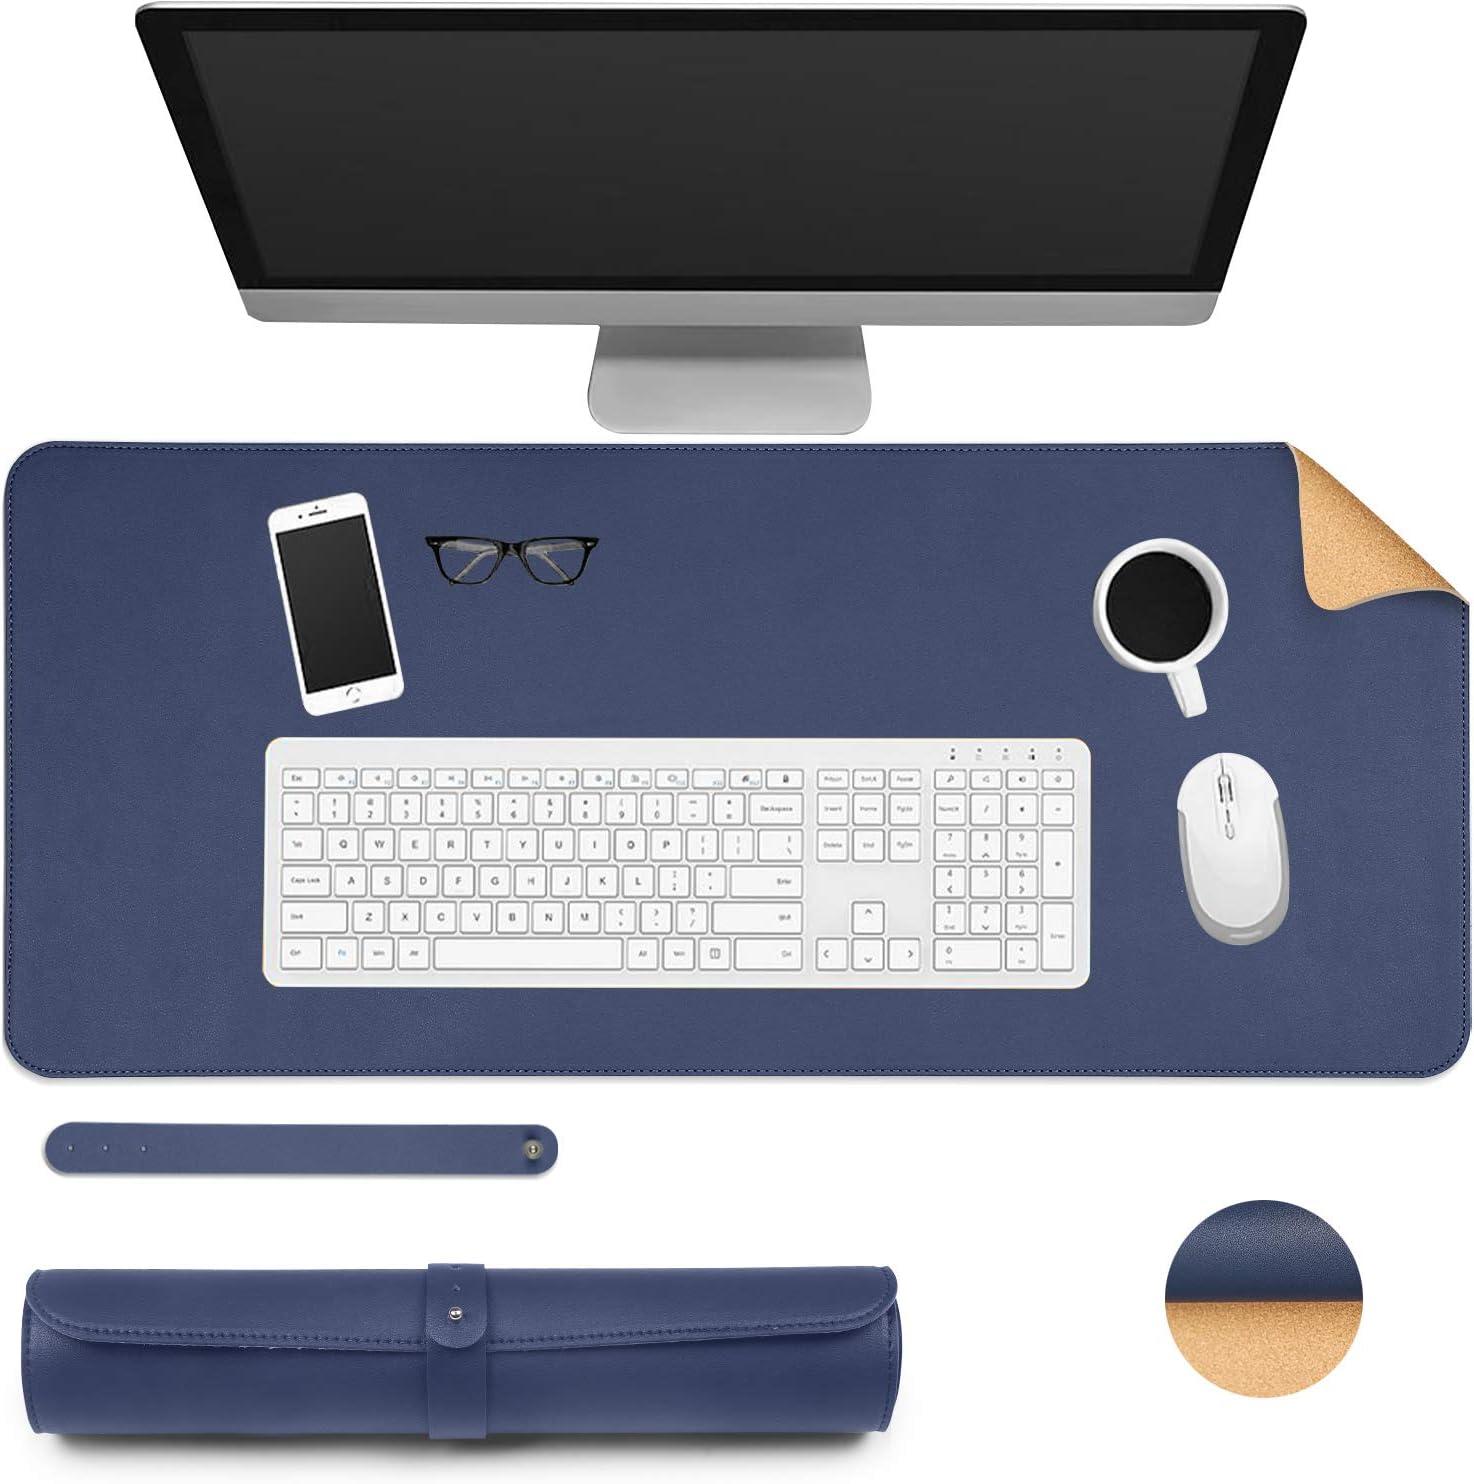 Ewolee Desk Pad 40cm Natural Cork PU Leather Desk Protector Mat Non-Slip Waterproof Laptop Keyboard Mouse Mat for Office Home School Office Desk Mat 80 Black + Cork